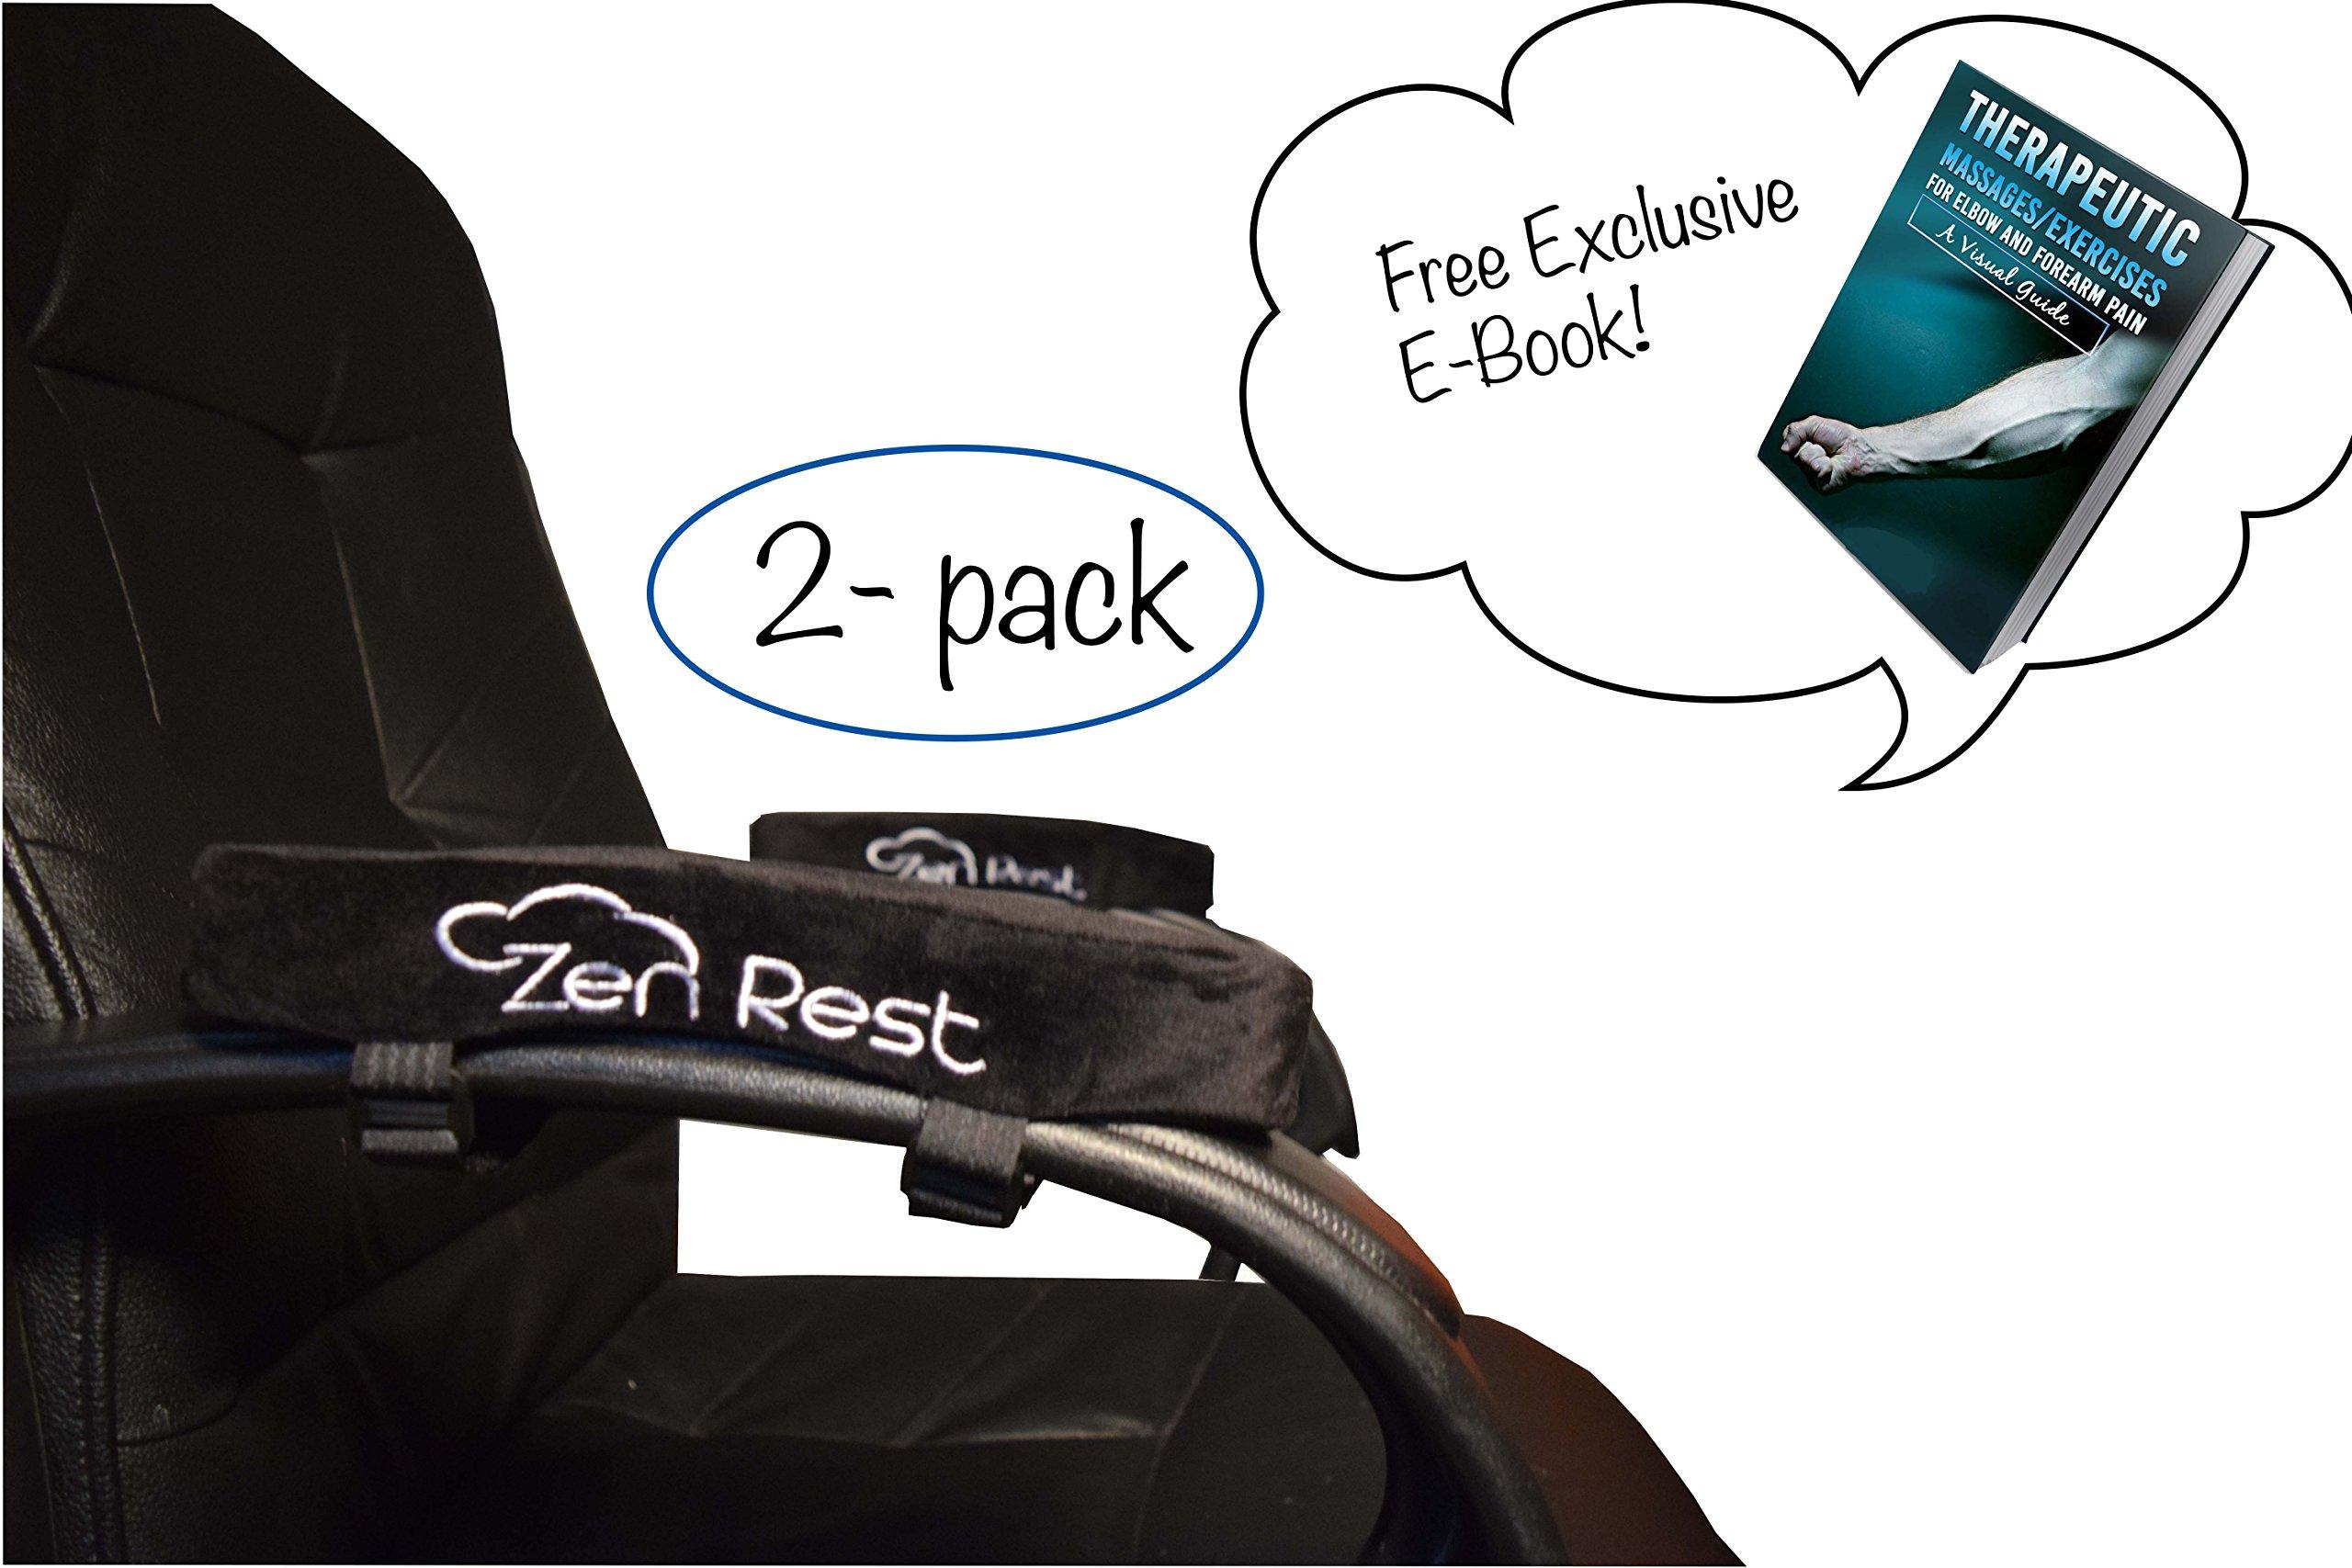 Zen Rest   Premium 50D Density Memory Foam   Armrest Cover Pad for Office Chair   2pcs   Extra Long Velcro Straps   Universal Fit  